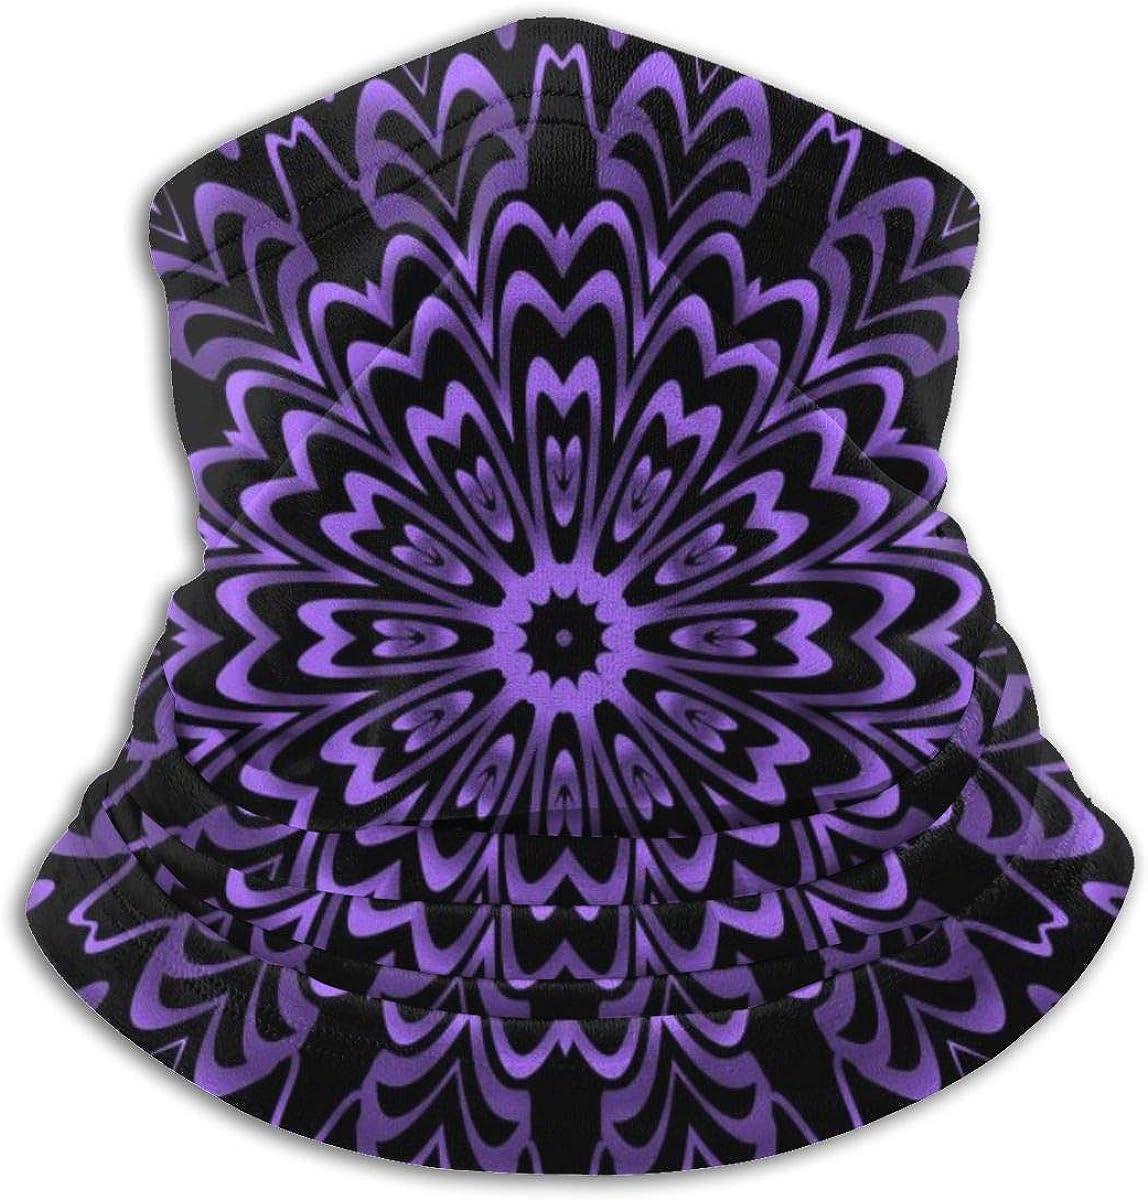 SLHFPX Neck Gaiter Face Mask Geometric Flower Purple Black Half Balaclava Ski Masks for Women Men Adult